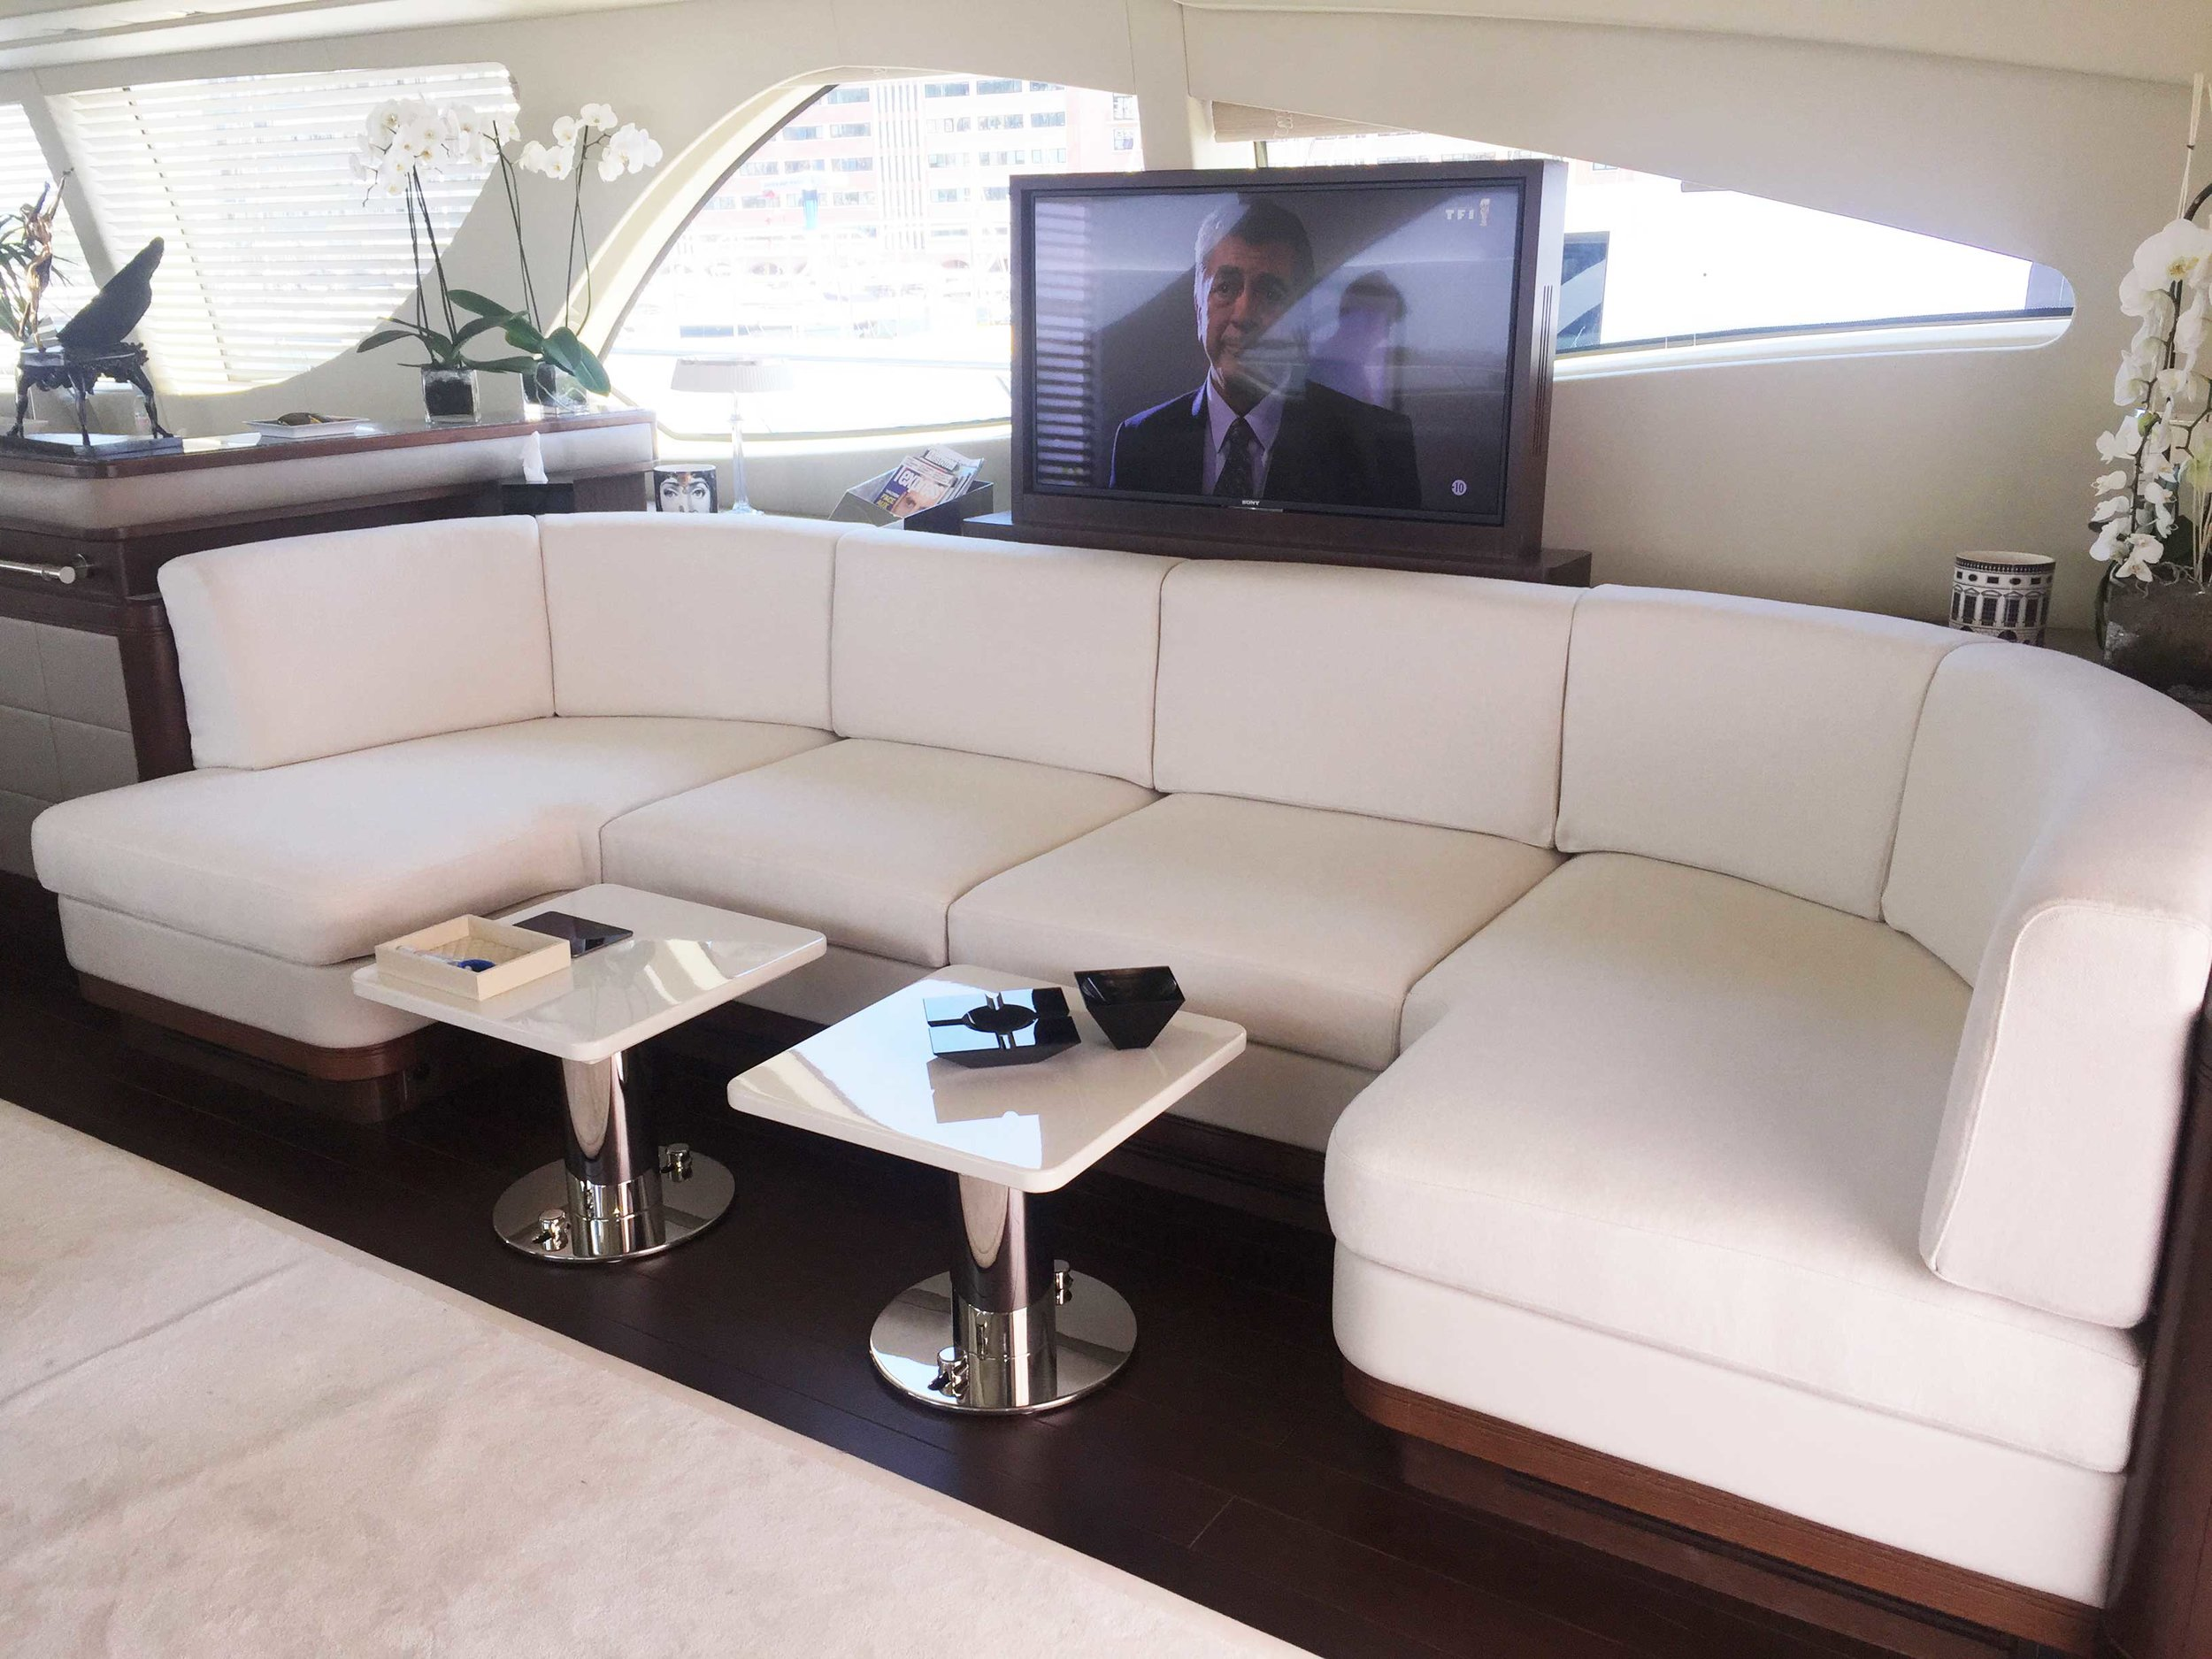 banquette,-yacht,-monaco,-blanc,-tissu,-gainage.jpg